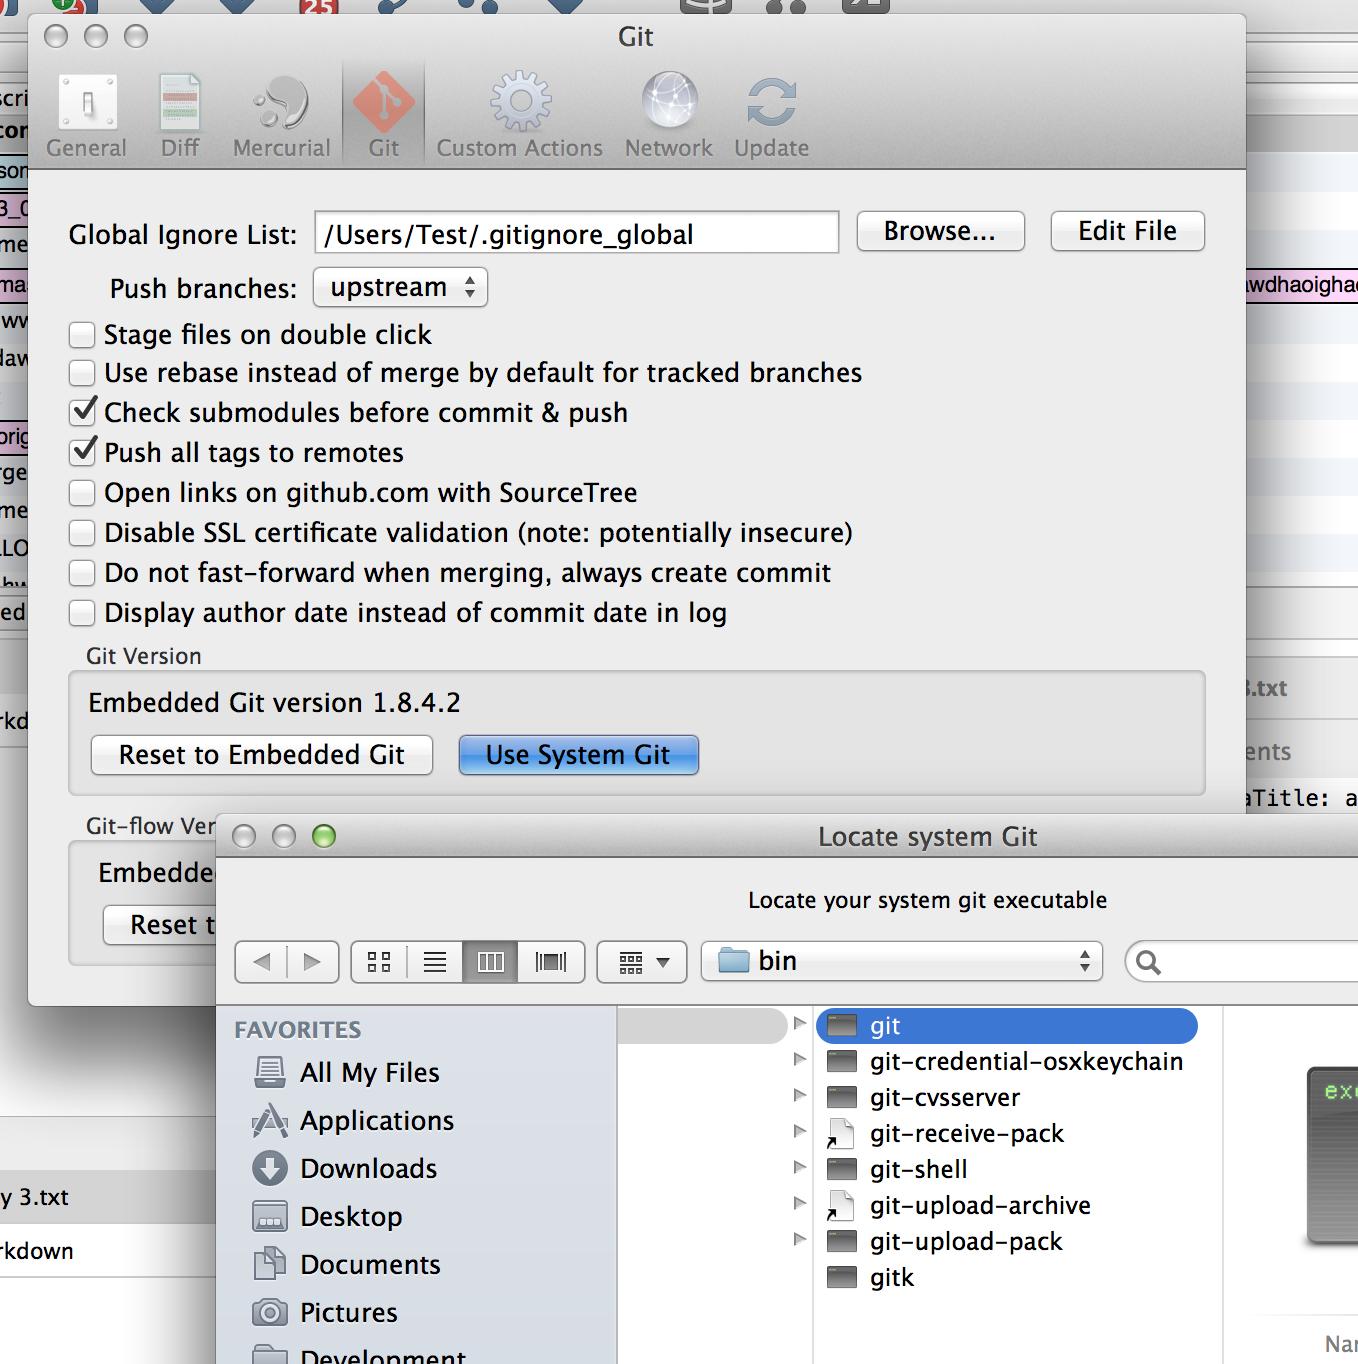 Upgrading Git/Mercurial in SourceTree for Mac - Atlassian